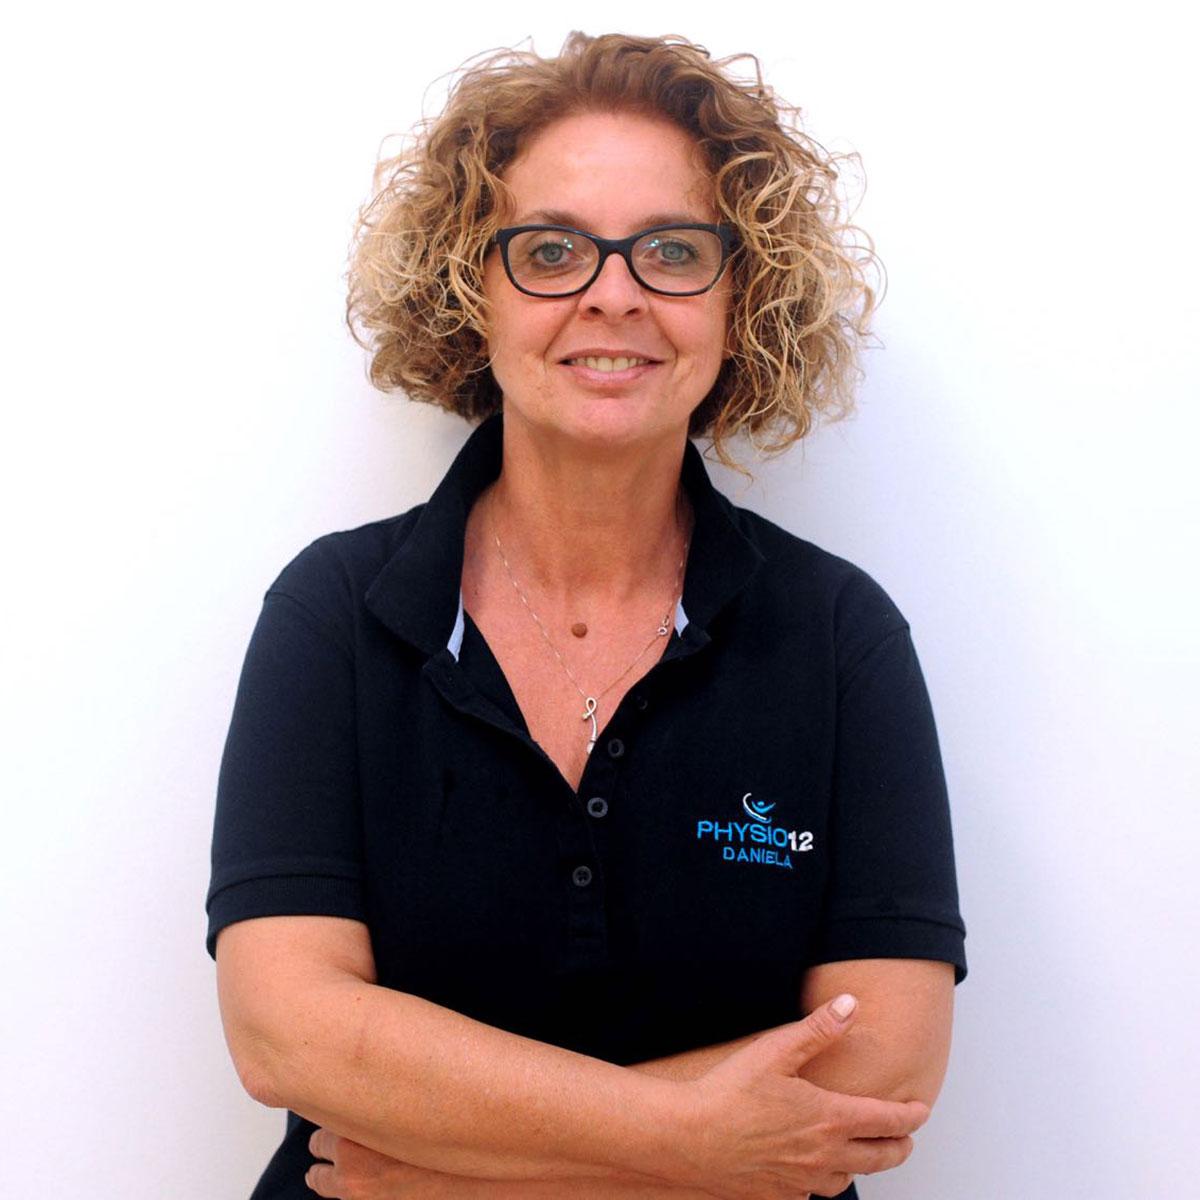 Dott.ssa Magalotti Daniela - Fisioterapista